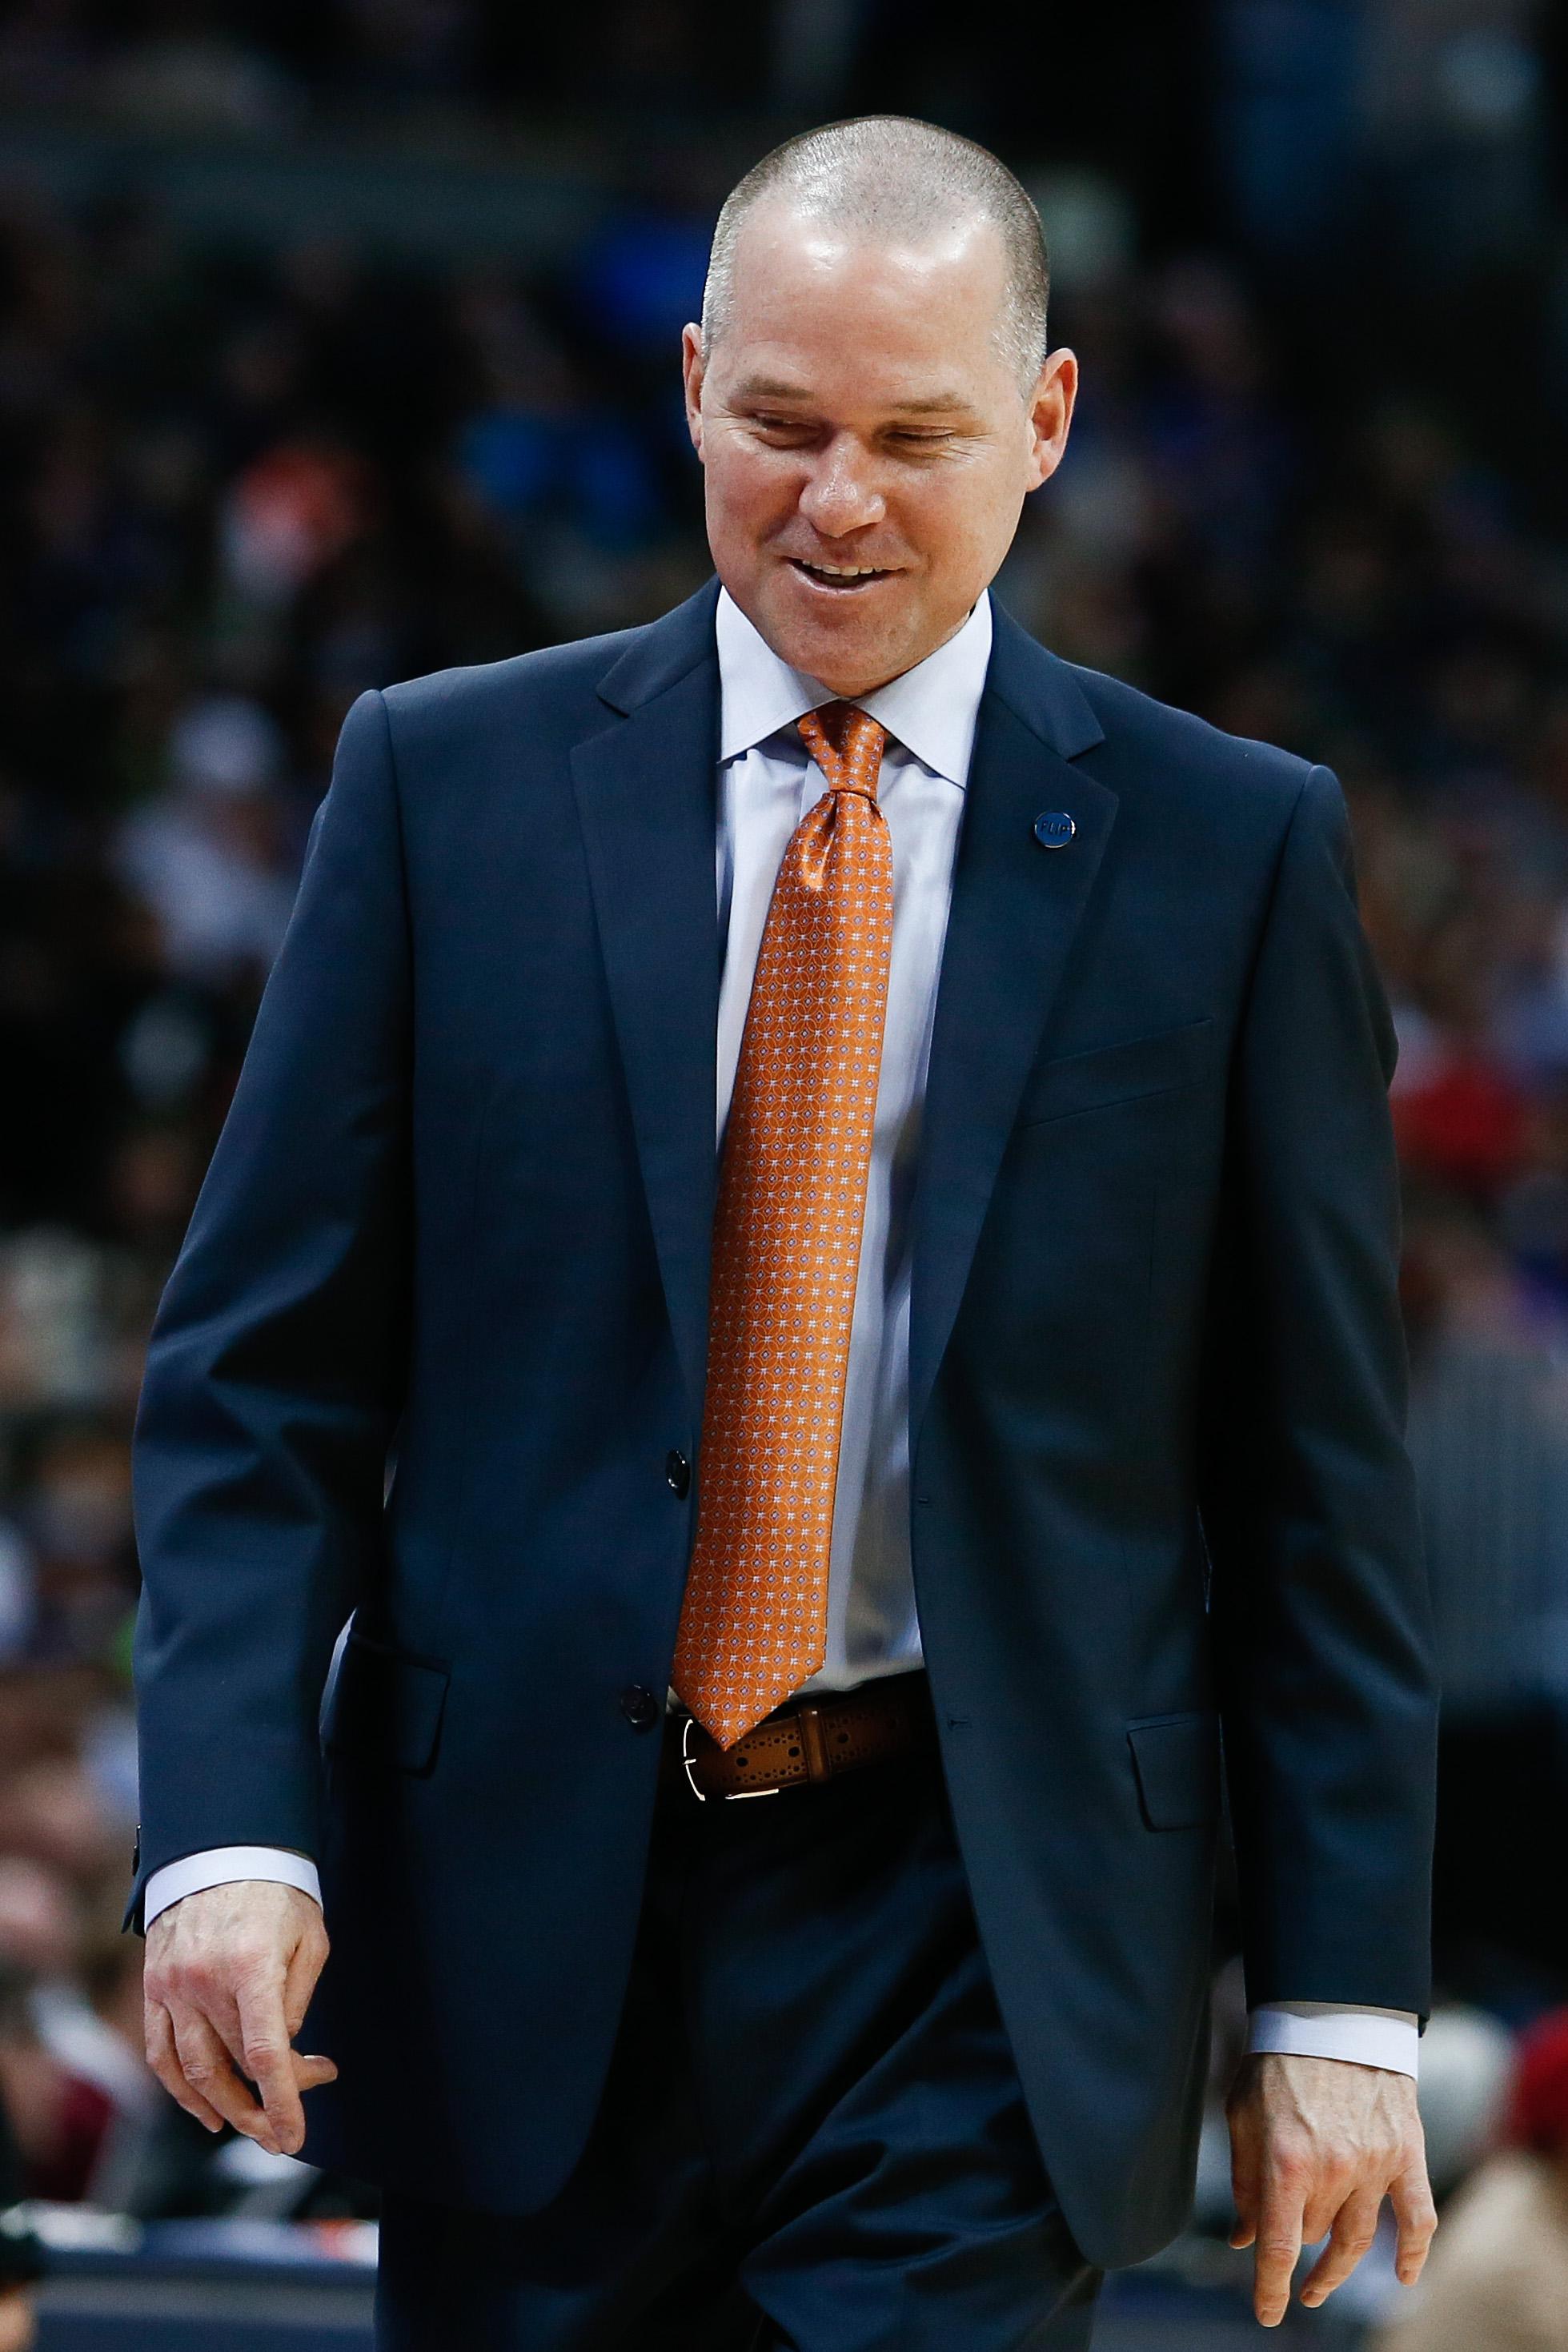 Denver Nuggets head coach Michael Malone